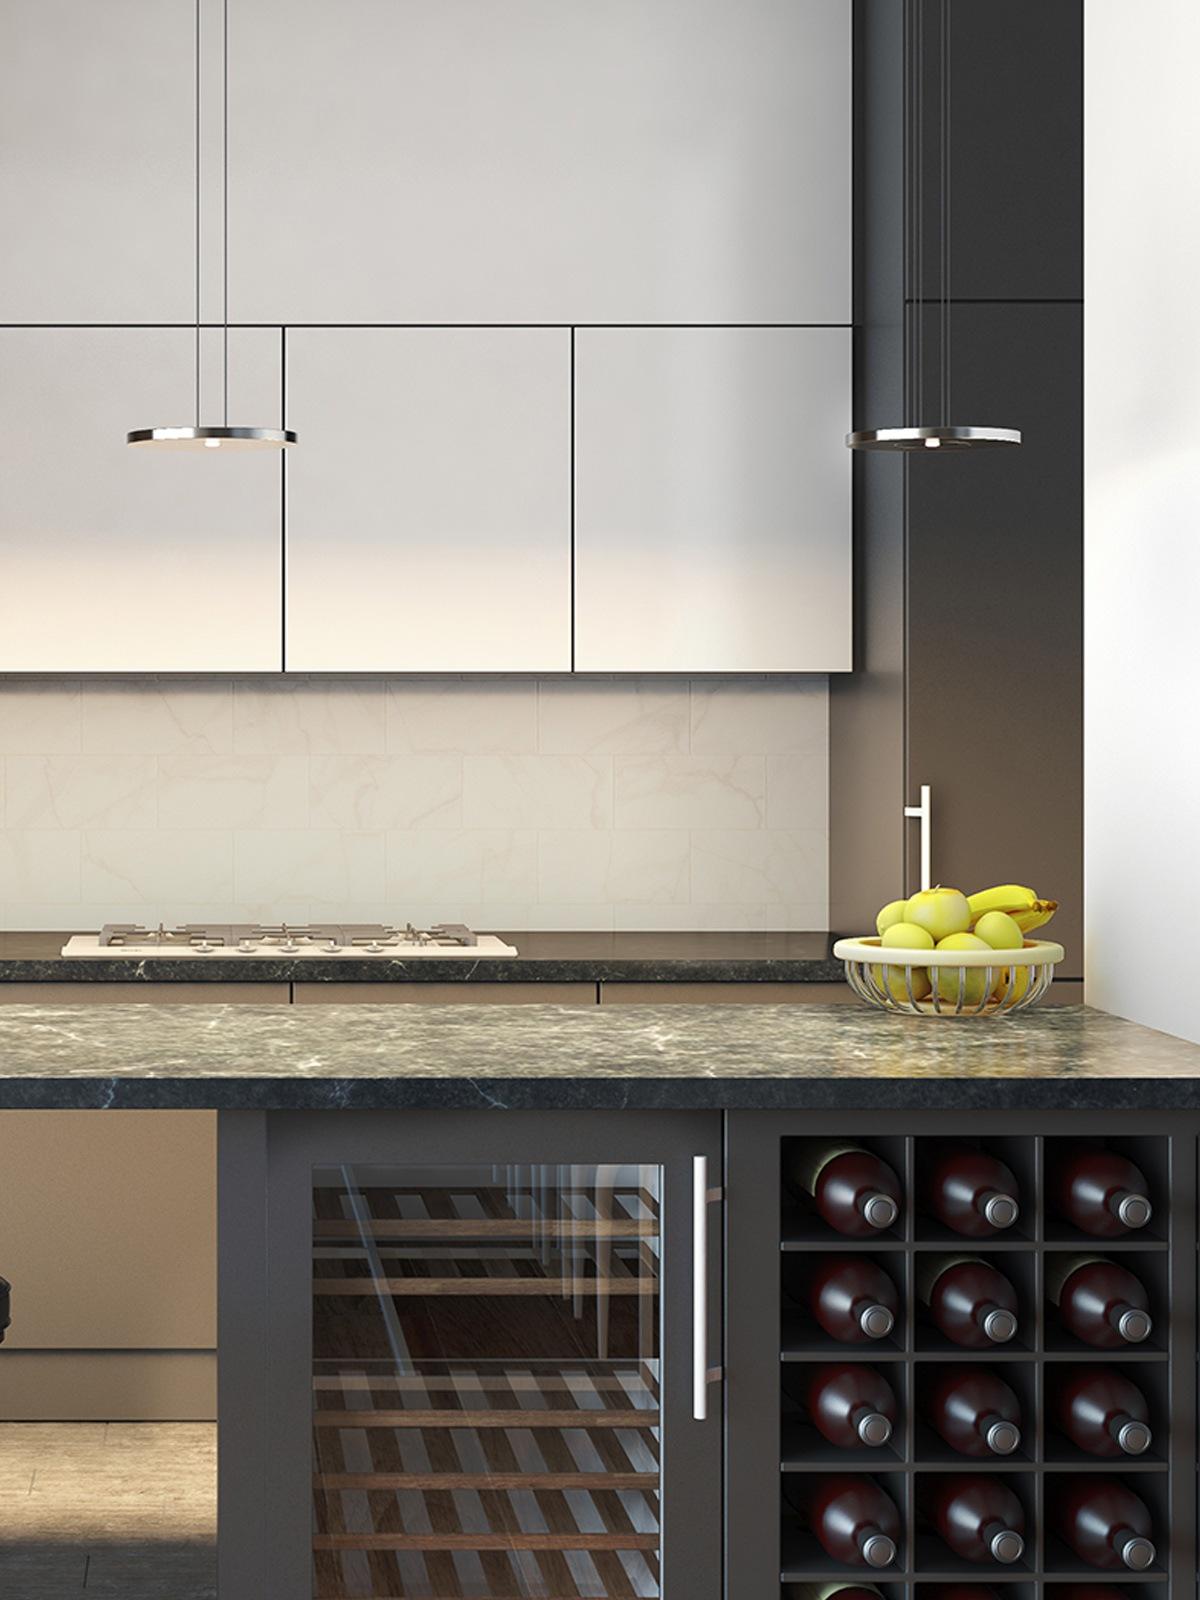 Piani Punto Downlight BYOK DesignOrt Lampen Berlin Onlineshop